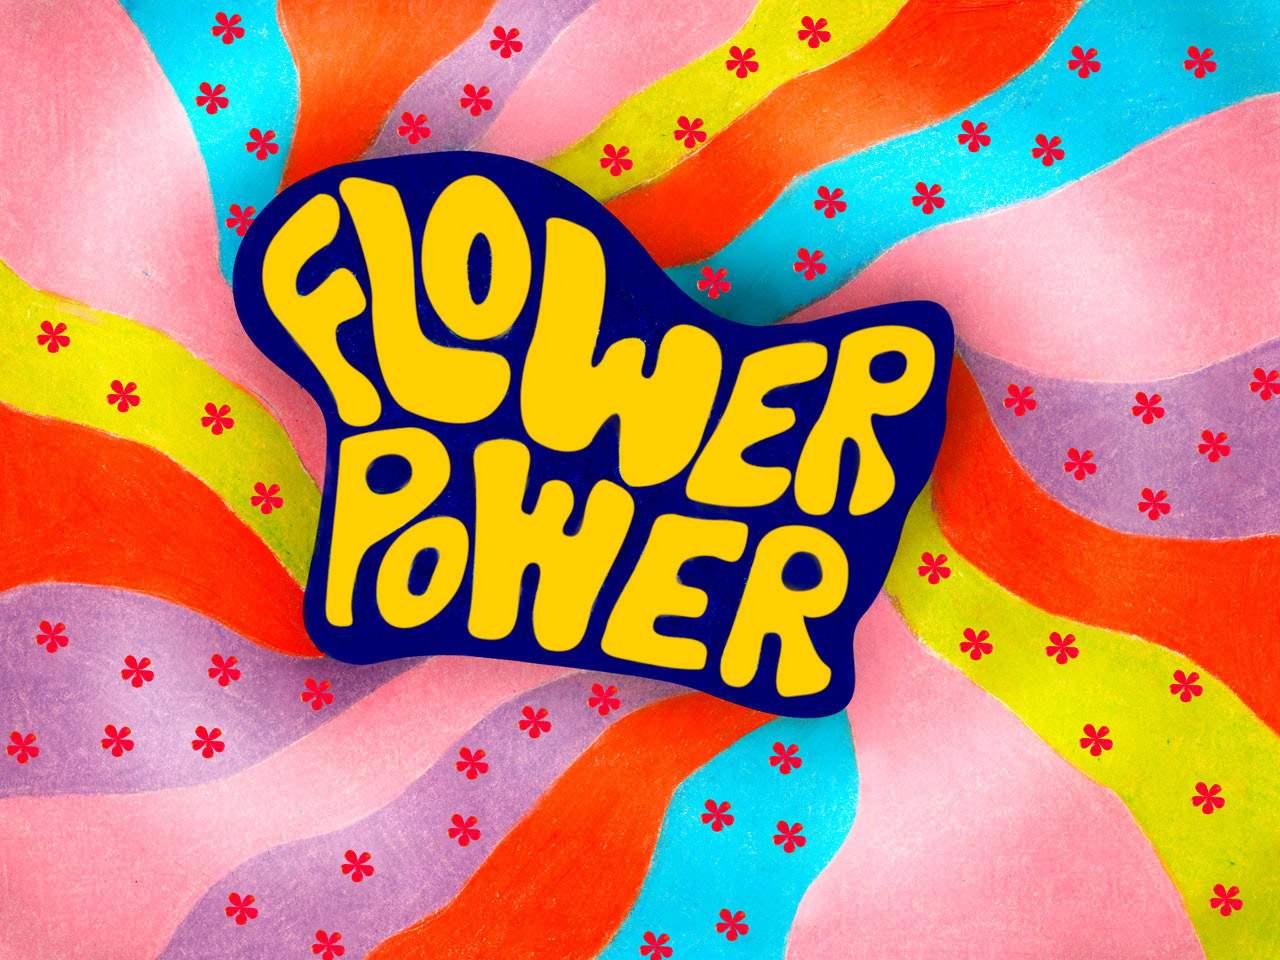 http://2.bp.blogspot.com/-IGcgRzHFjuo/T-1Lm04ANjI/AAAAAAAAAD8/u8SRQT5mhZI/s1600/Flower+Power.jpg